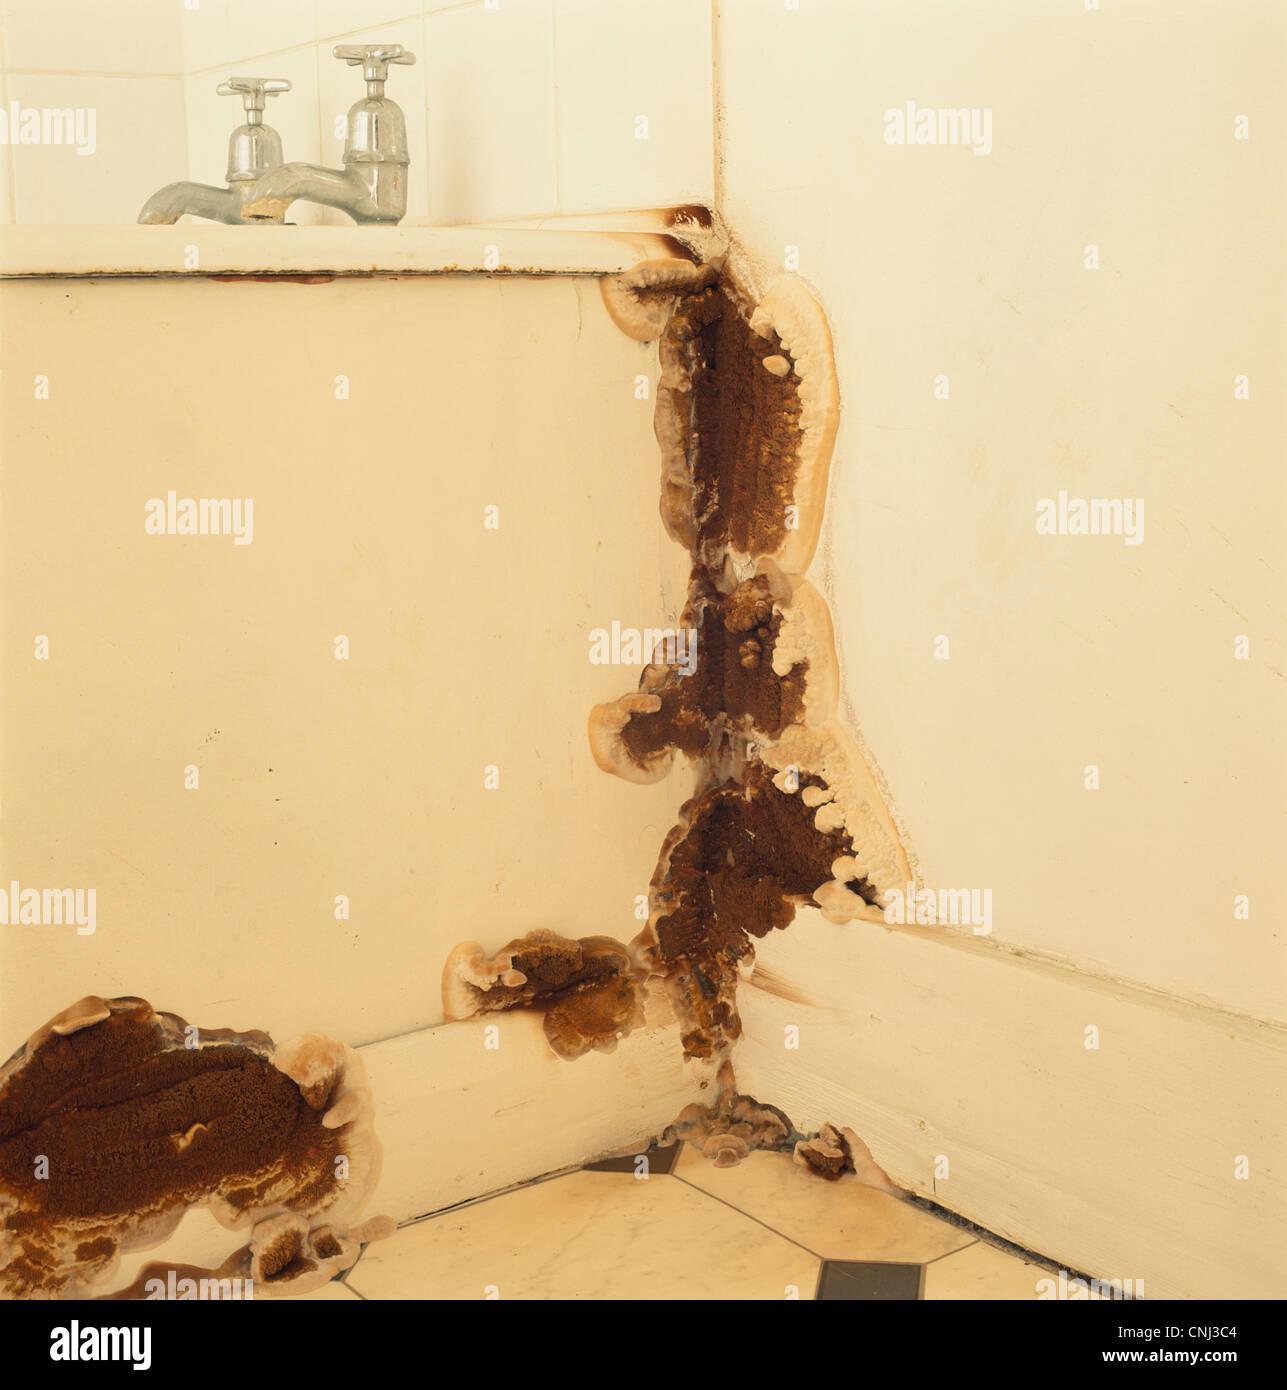 Hausschwamm Pilz Fruchtkörper im Badezimmer UK Stockfoto, Bild ...